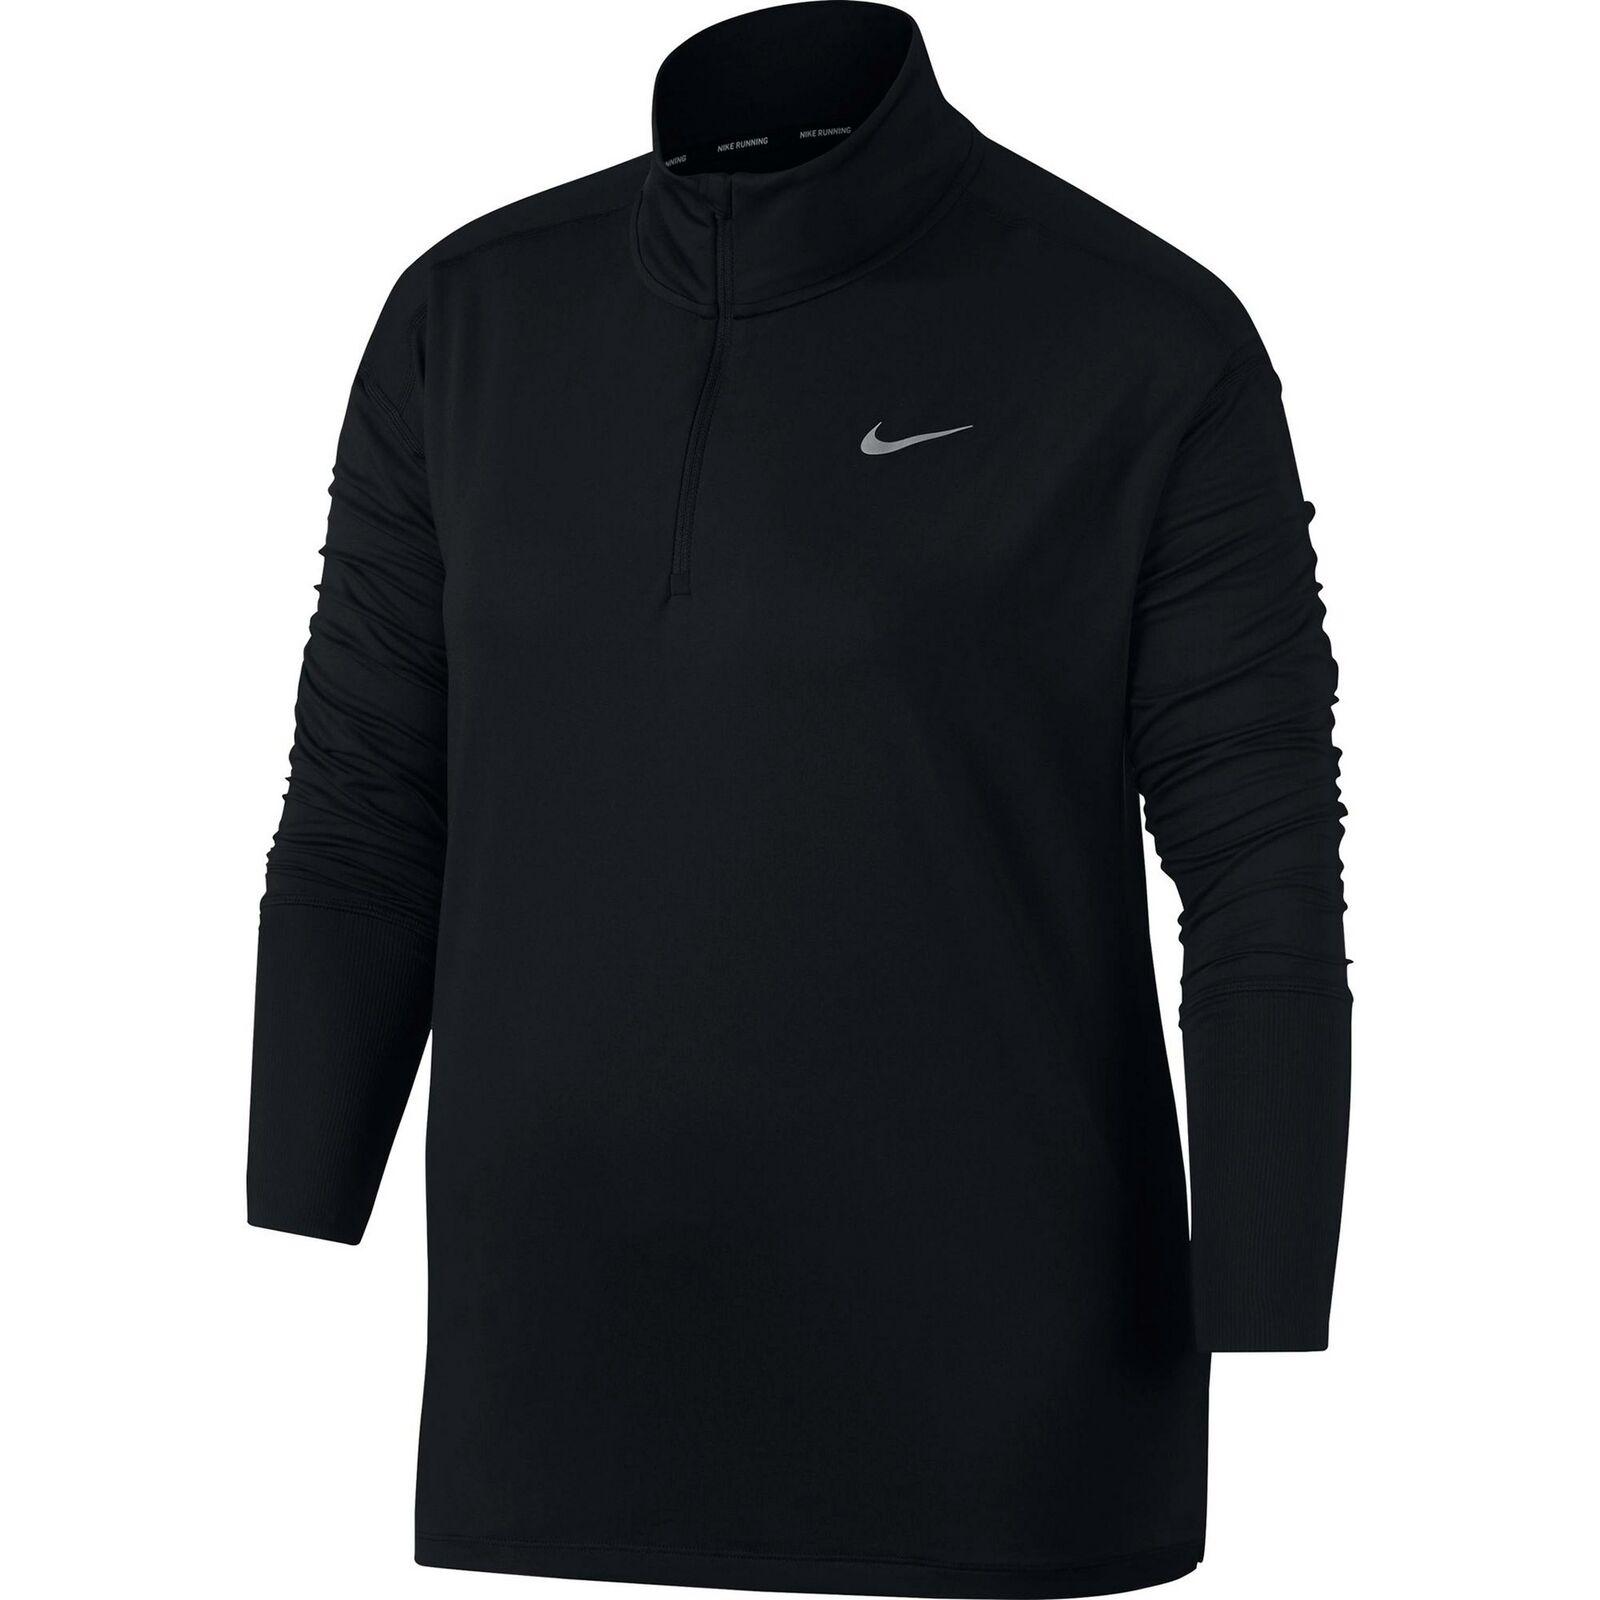 Nike Performance Laufshirt Damen Training,Laufen,Trailrunning Shirt